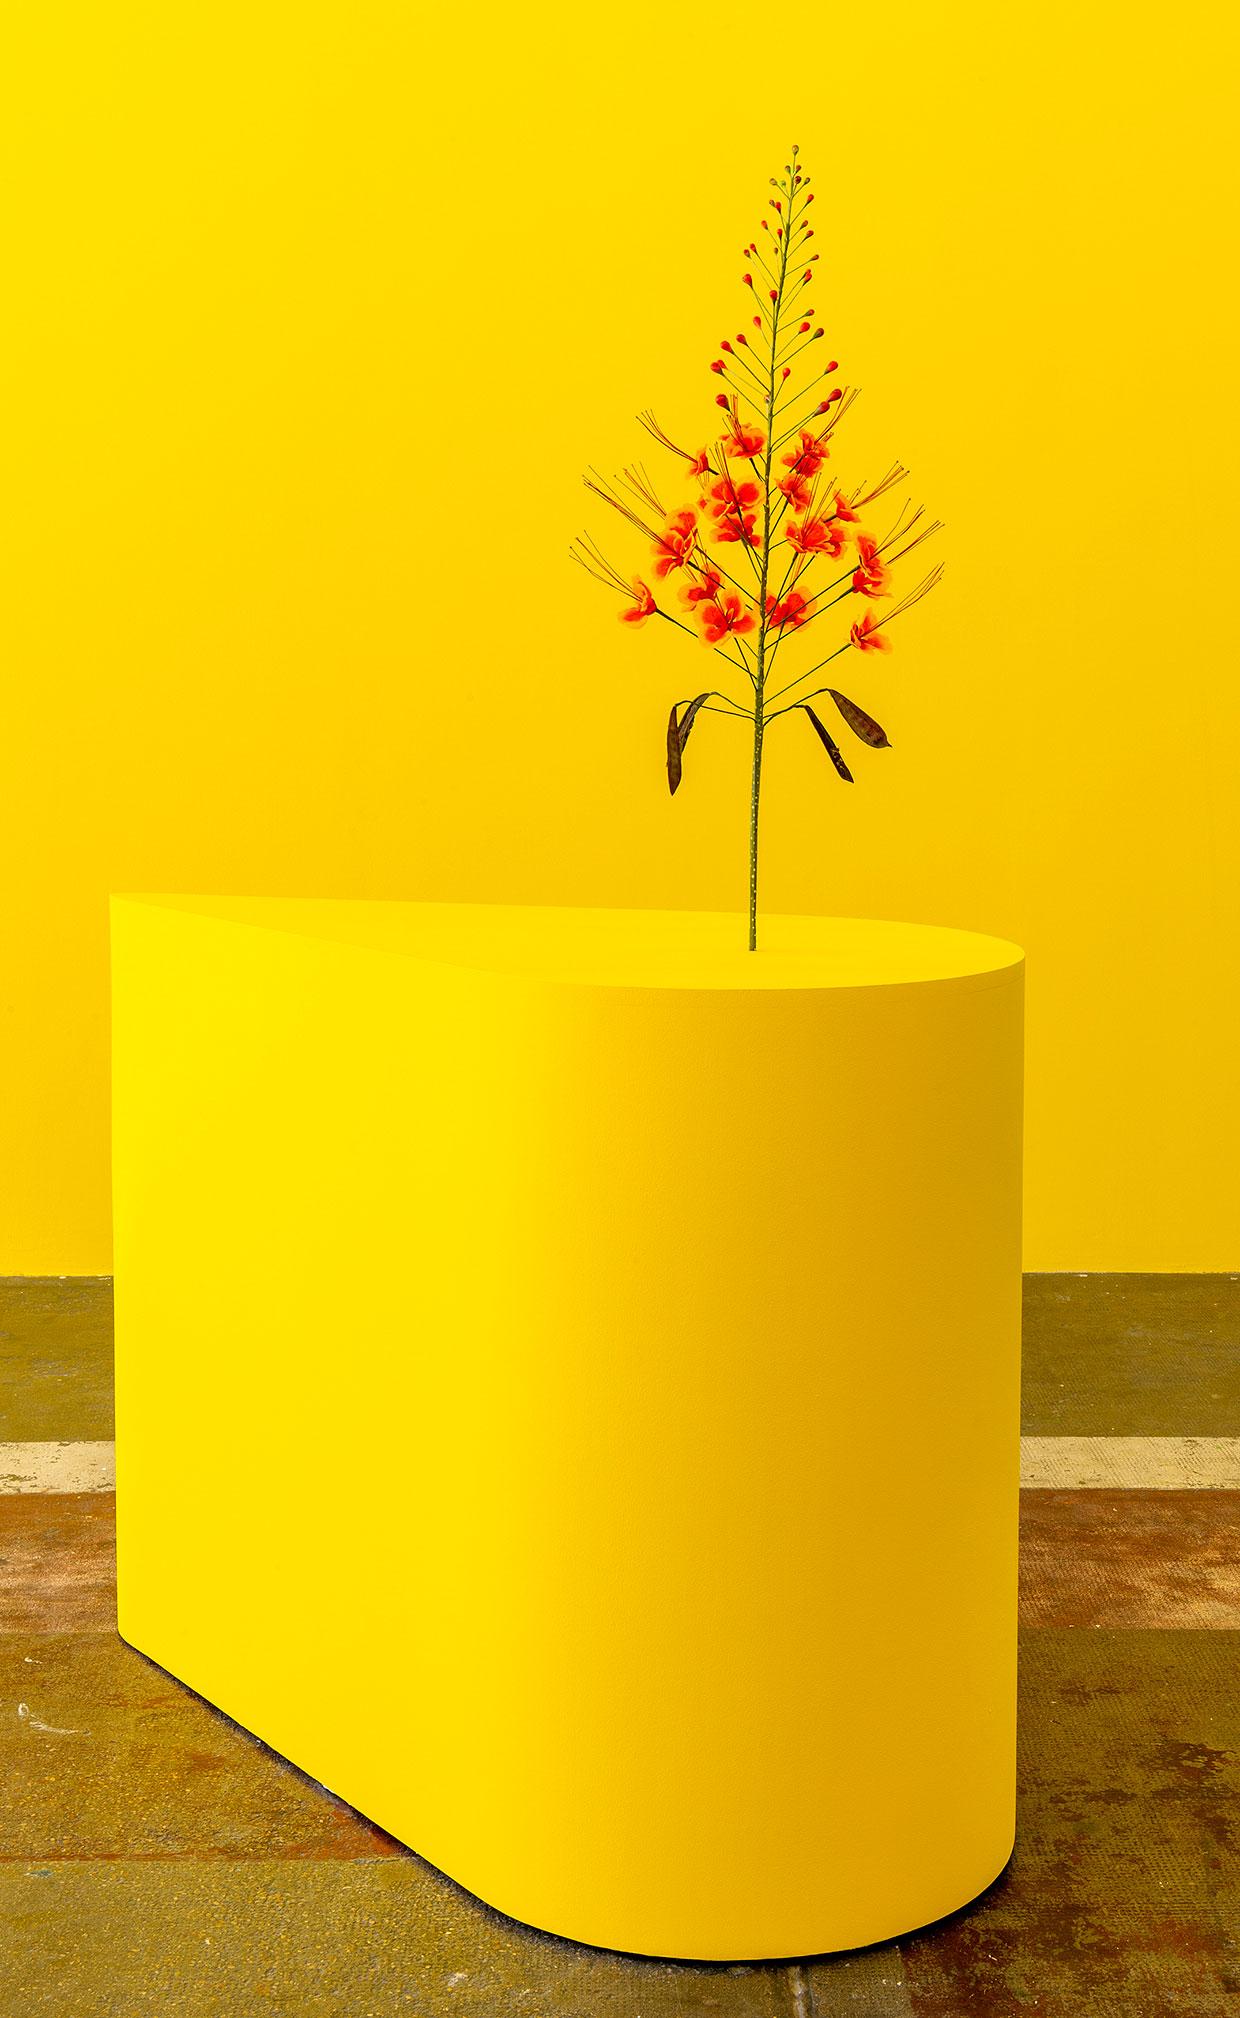 Kapwani Kiwanga, The Marias, 2020. Courtesy Centre d'art contemporaine d'Ivry - le Crédac, the artist and Galerie Tanja Wagner, Berlin. Photo: Marc Domage